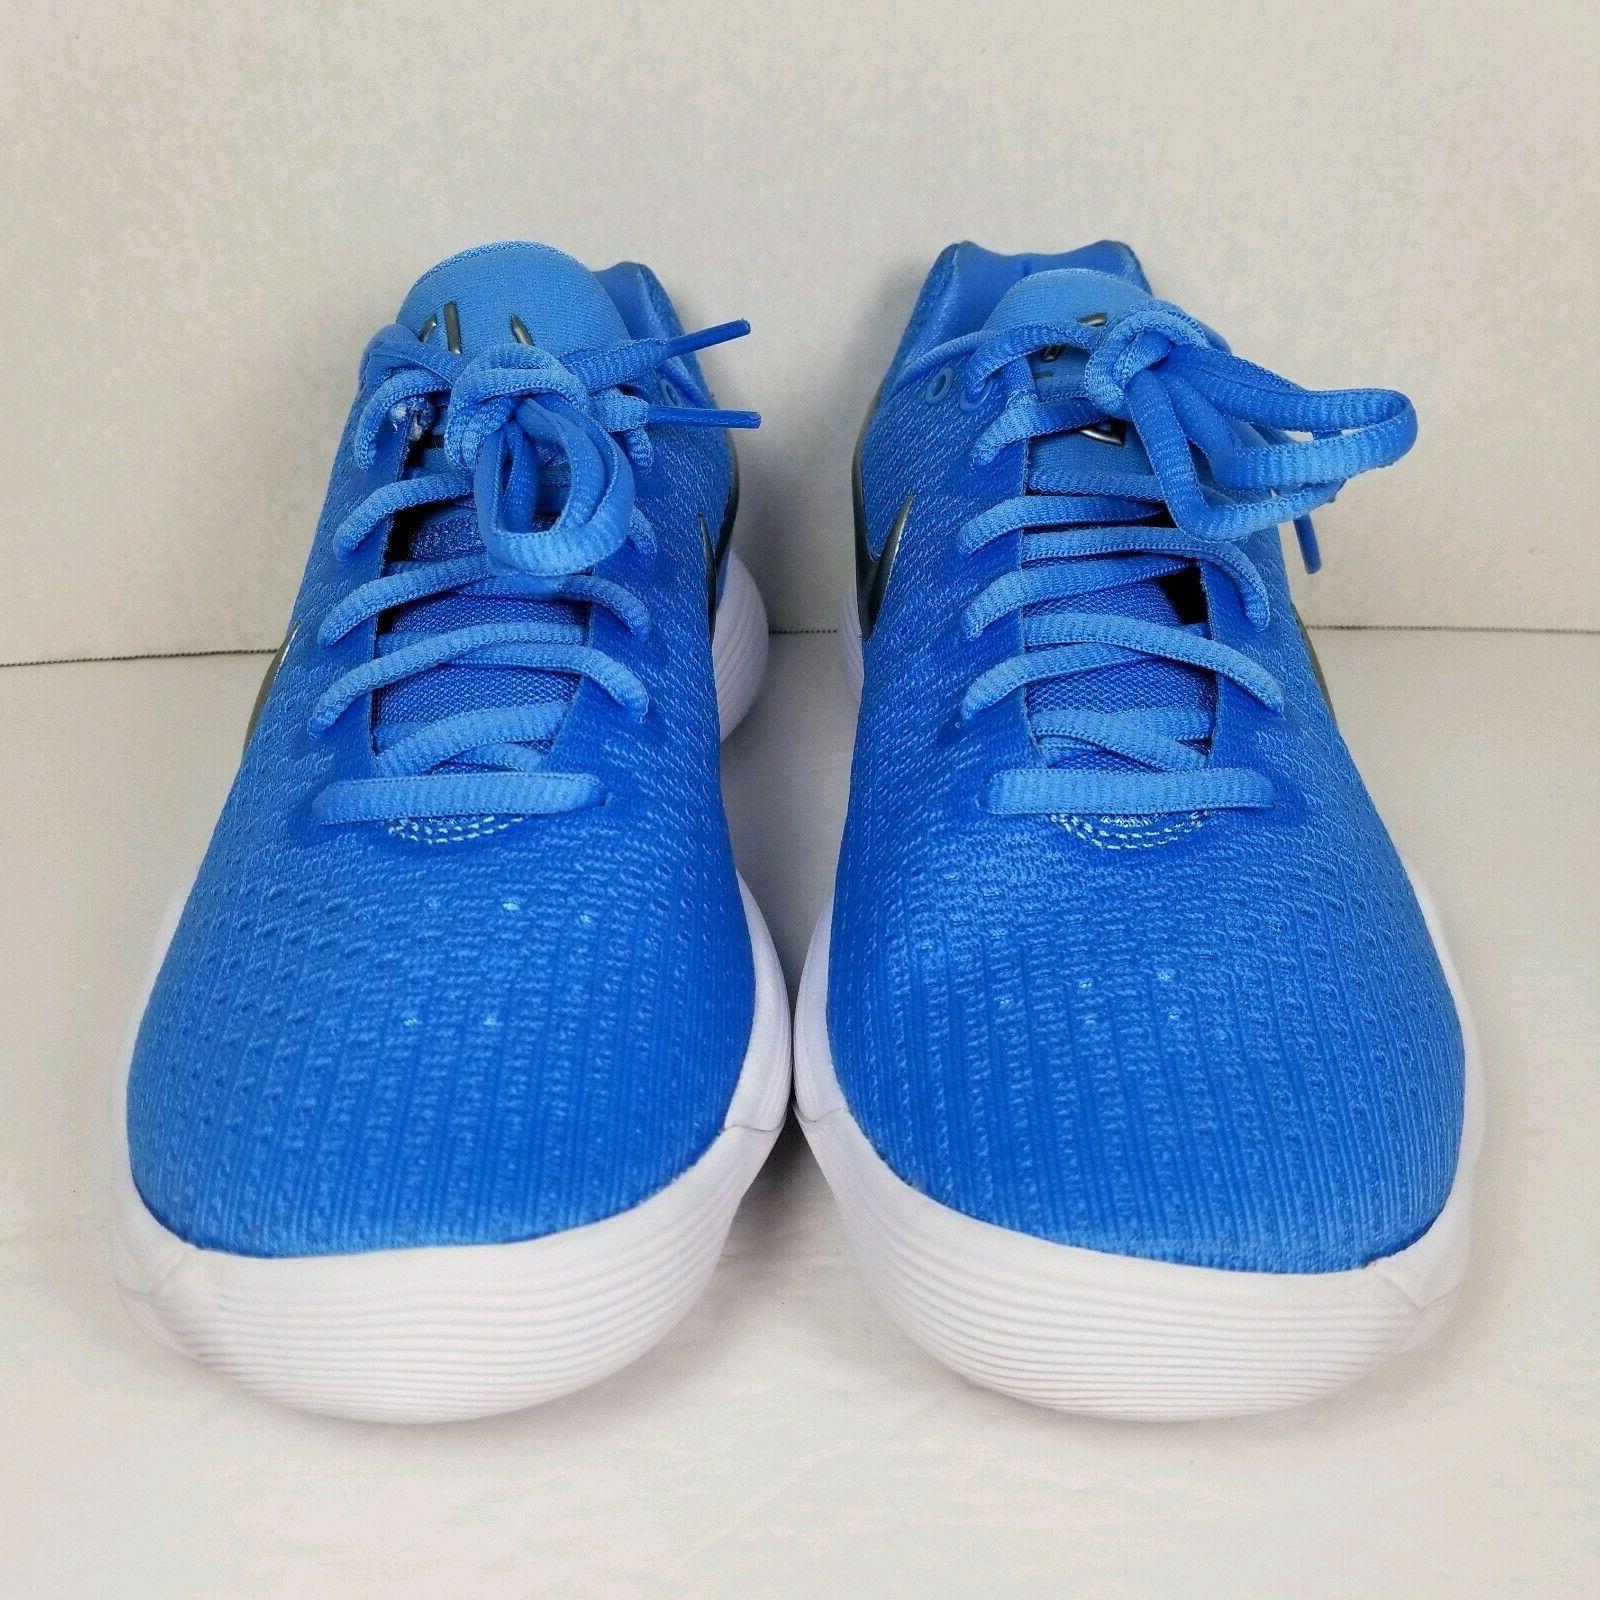 Nike Hyperdunk Blue Shoes 942774-406 - Size 14